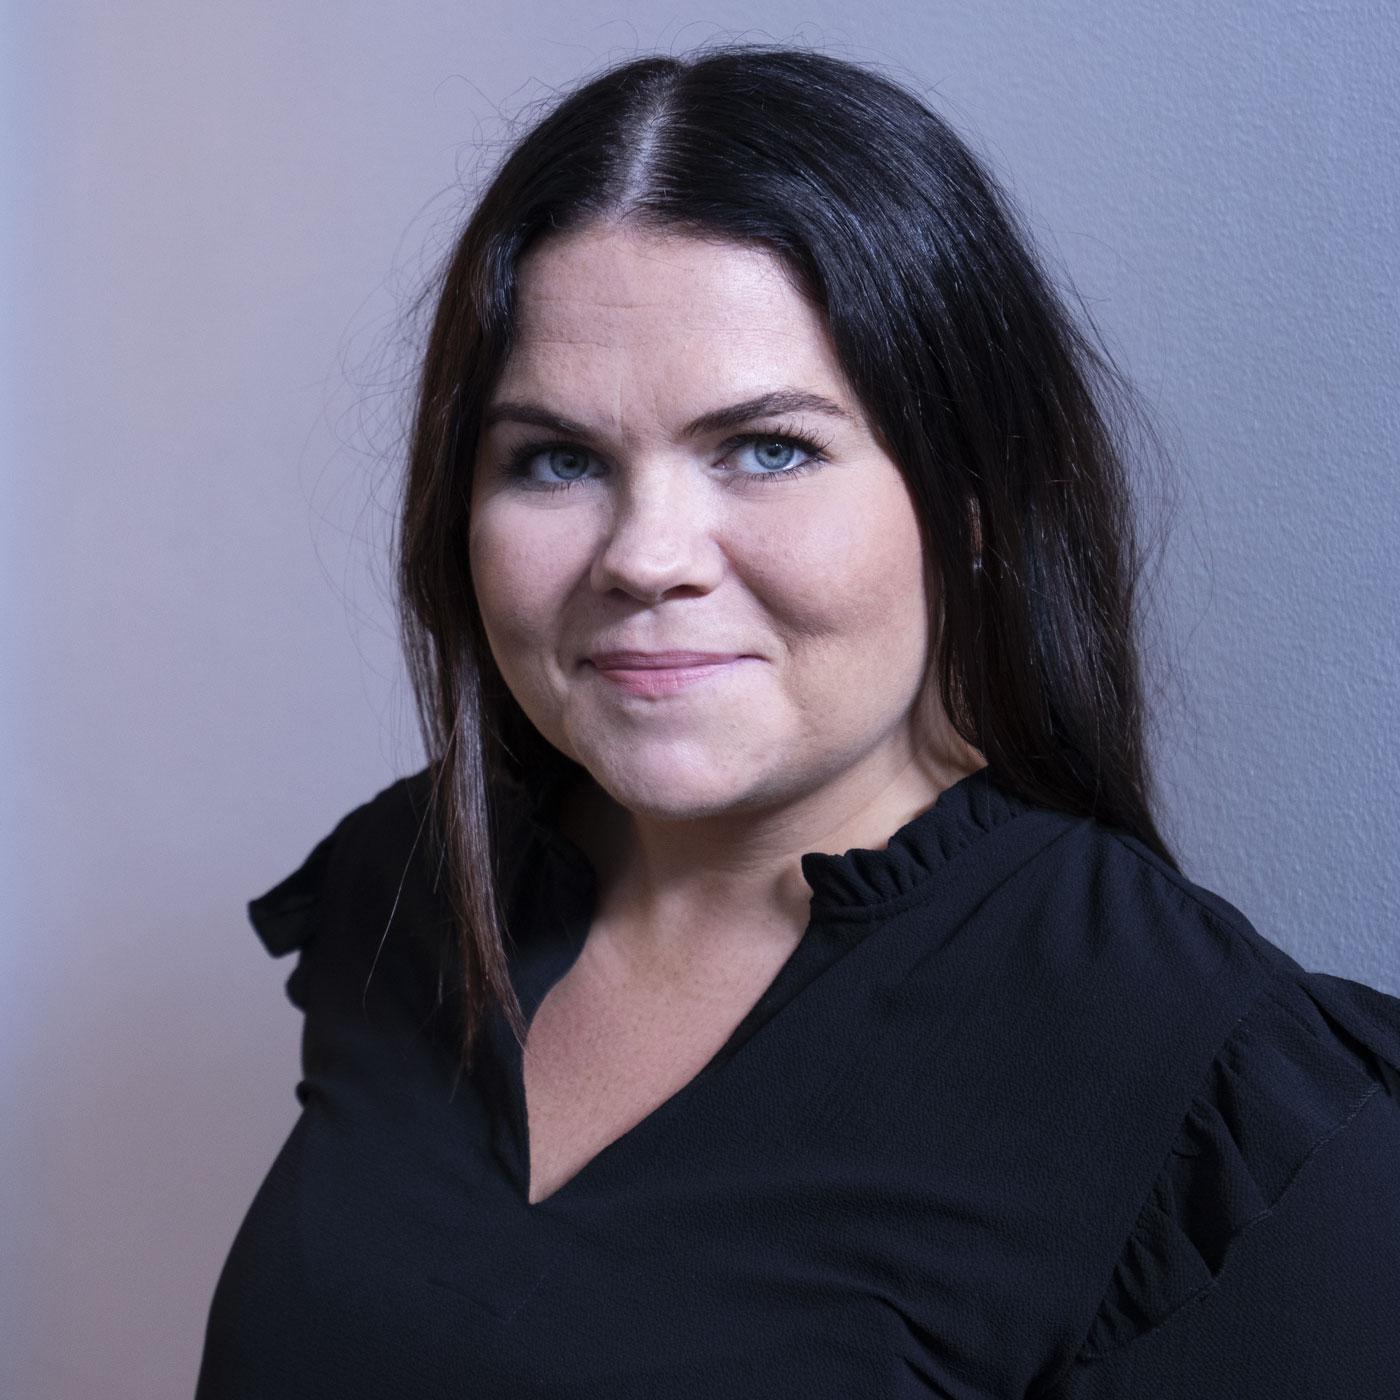 Läkarjouren - Sofia Sandquist